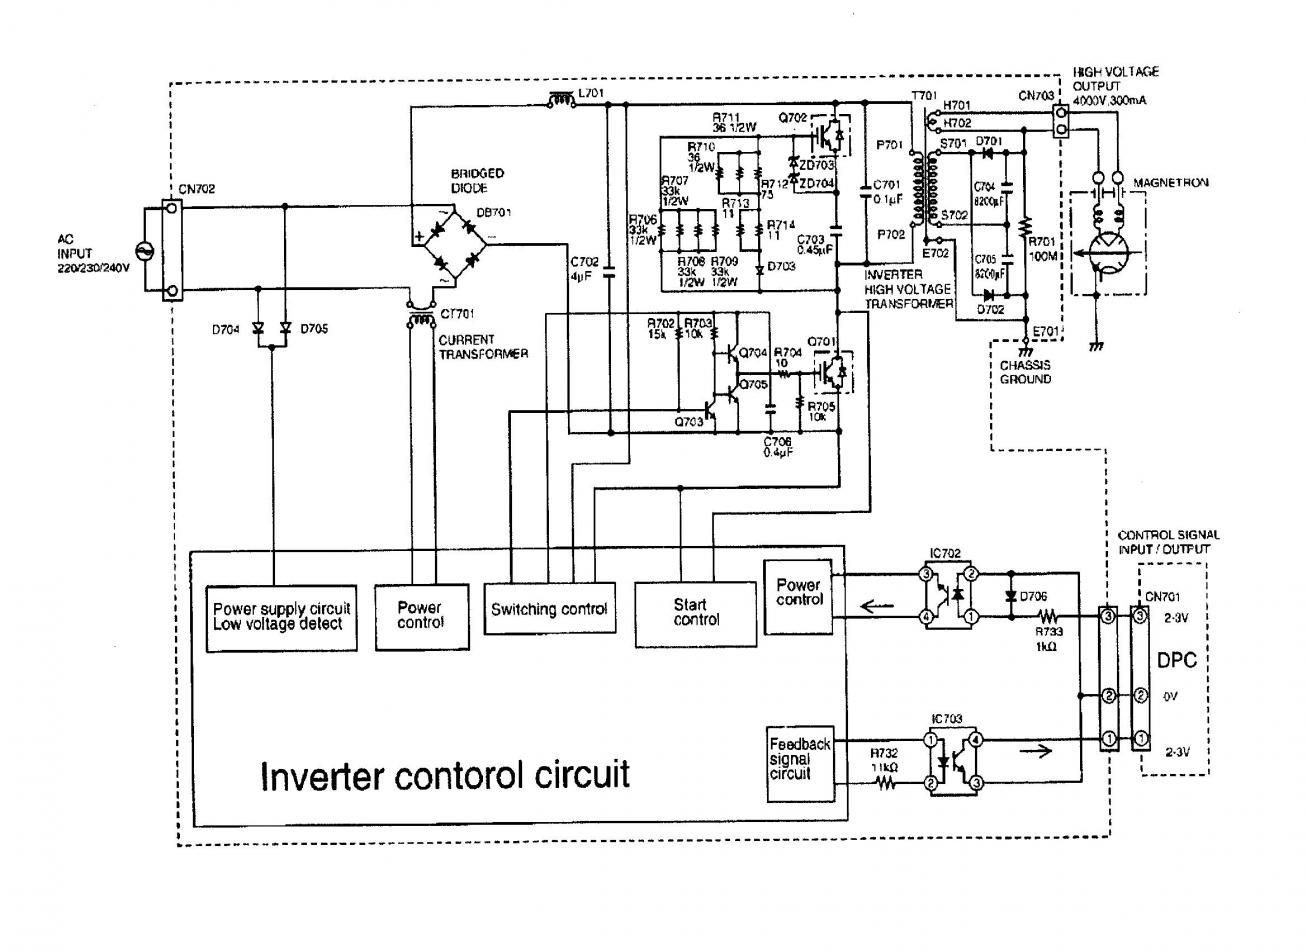 panasonic microwave schematic diagram wiring diagram toolbox panasonic microwave oven circuit diagram microwave oven schematic microwave [ 1307 x 950 Pixel ]